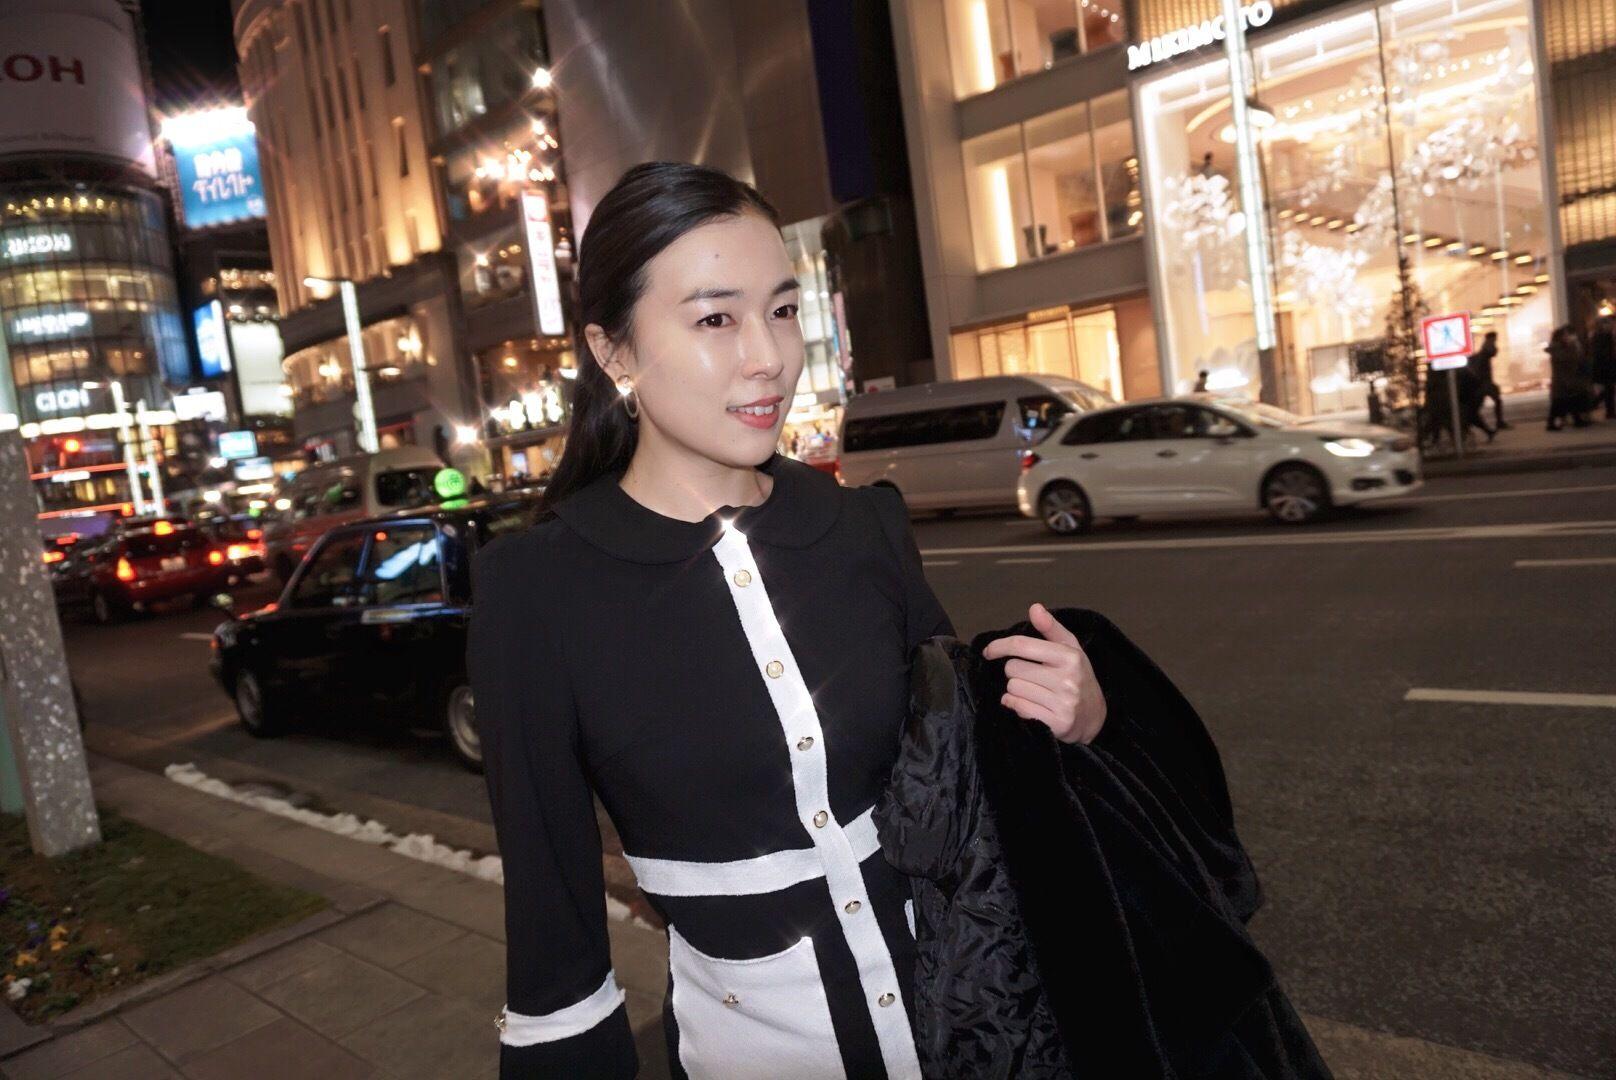 THE REAL LADYワンンピースSEASON2【聡明・気品・優美】